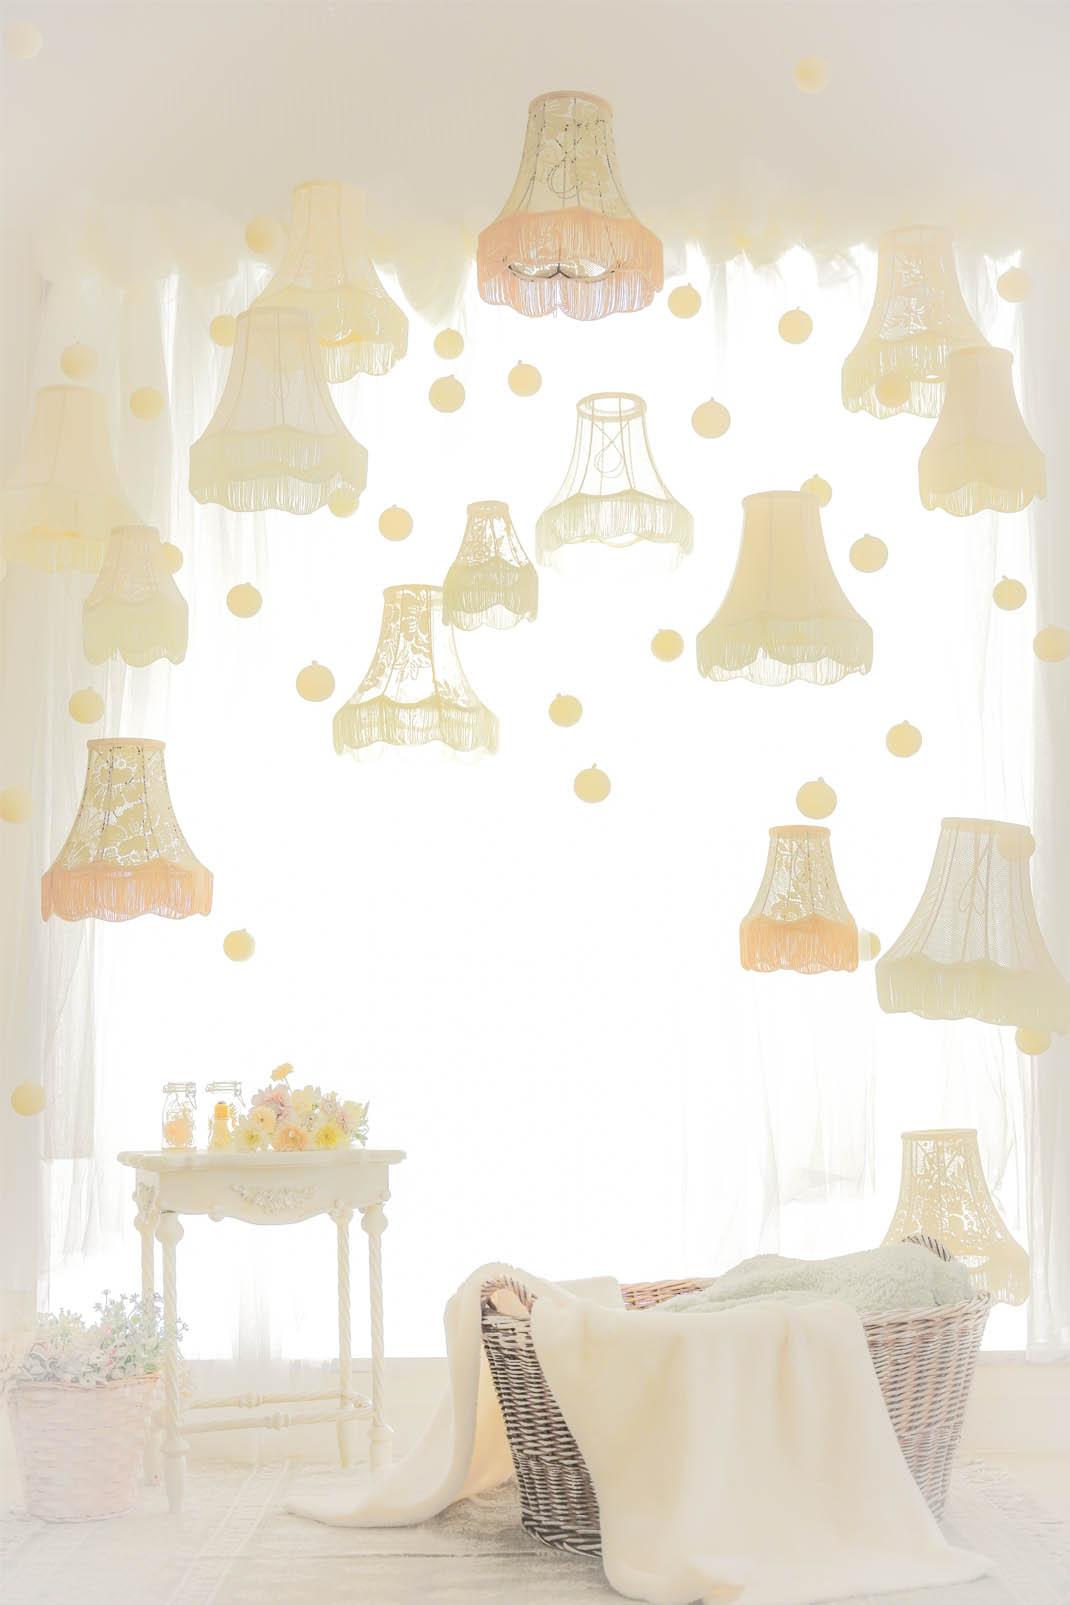 Nachu By Studio Arcかわさきコーナン小田栄店のご紹介 赤ちゃん こどもの写真館スタジオアーク プラスナチュ